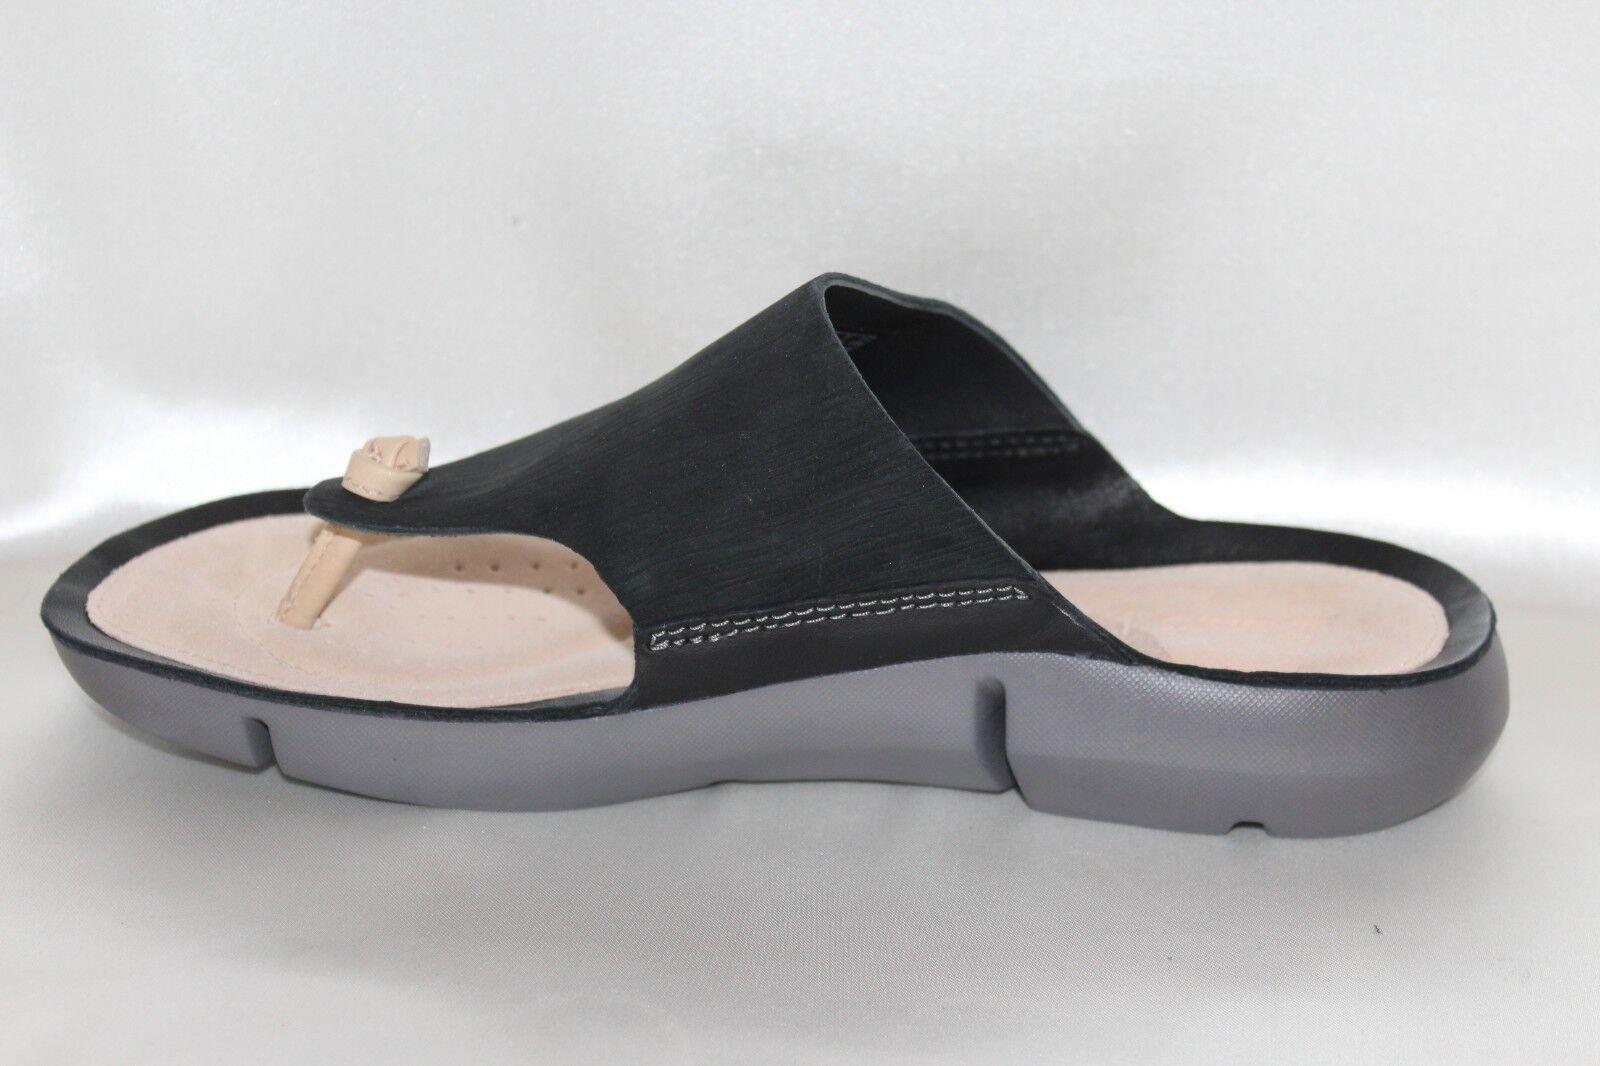 Clarks trigenic Negro Negro Negro Nubuck Tri Carmen Flip Flop Sandalia de tanga talla 8.5 fba9e1